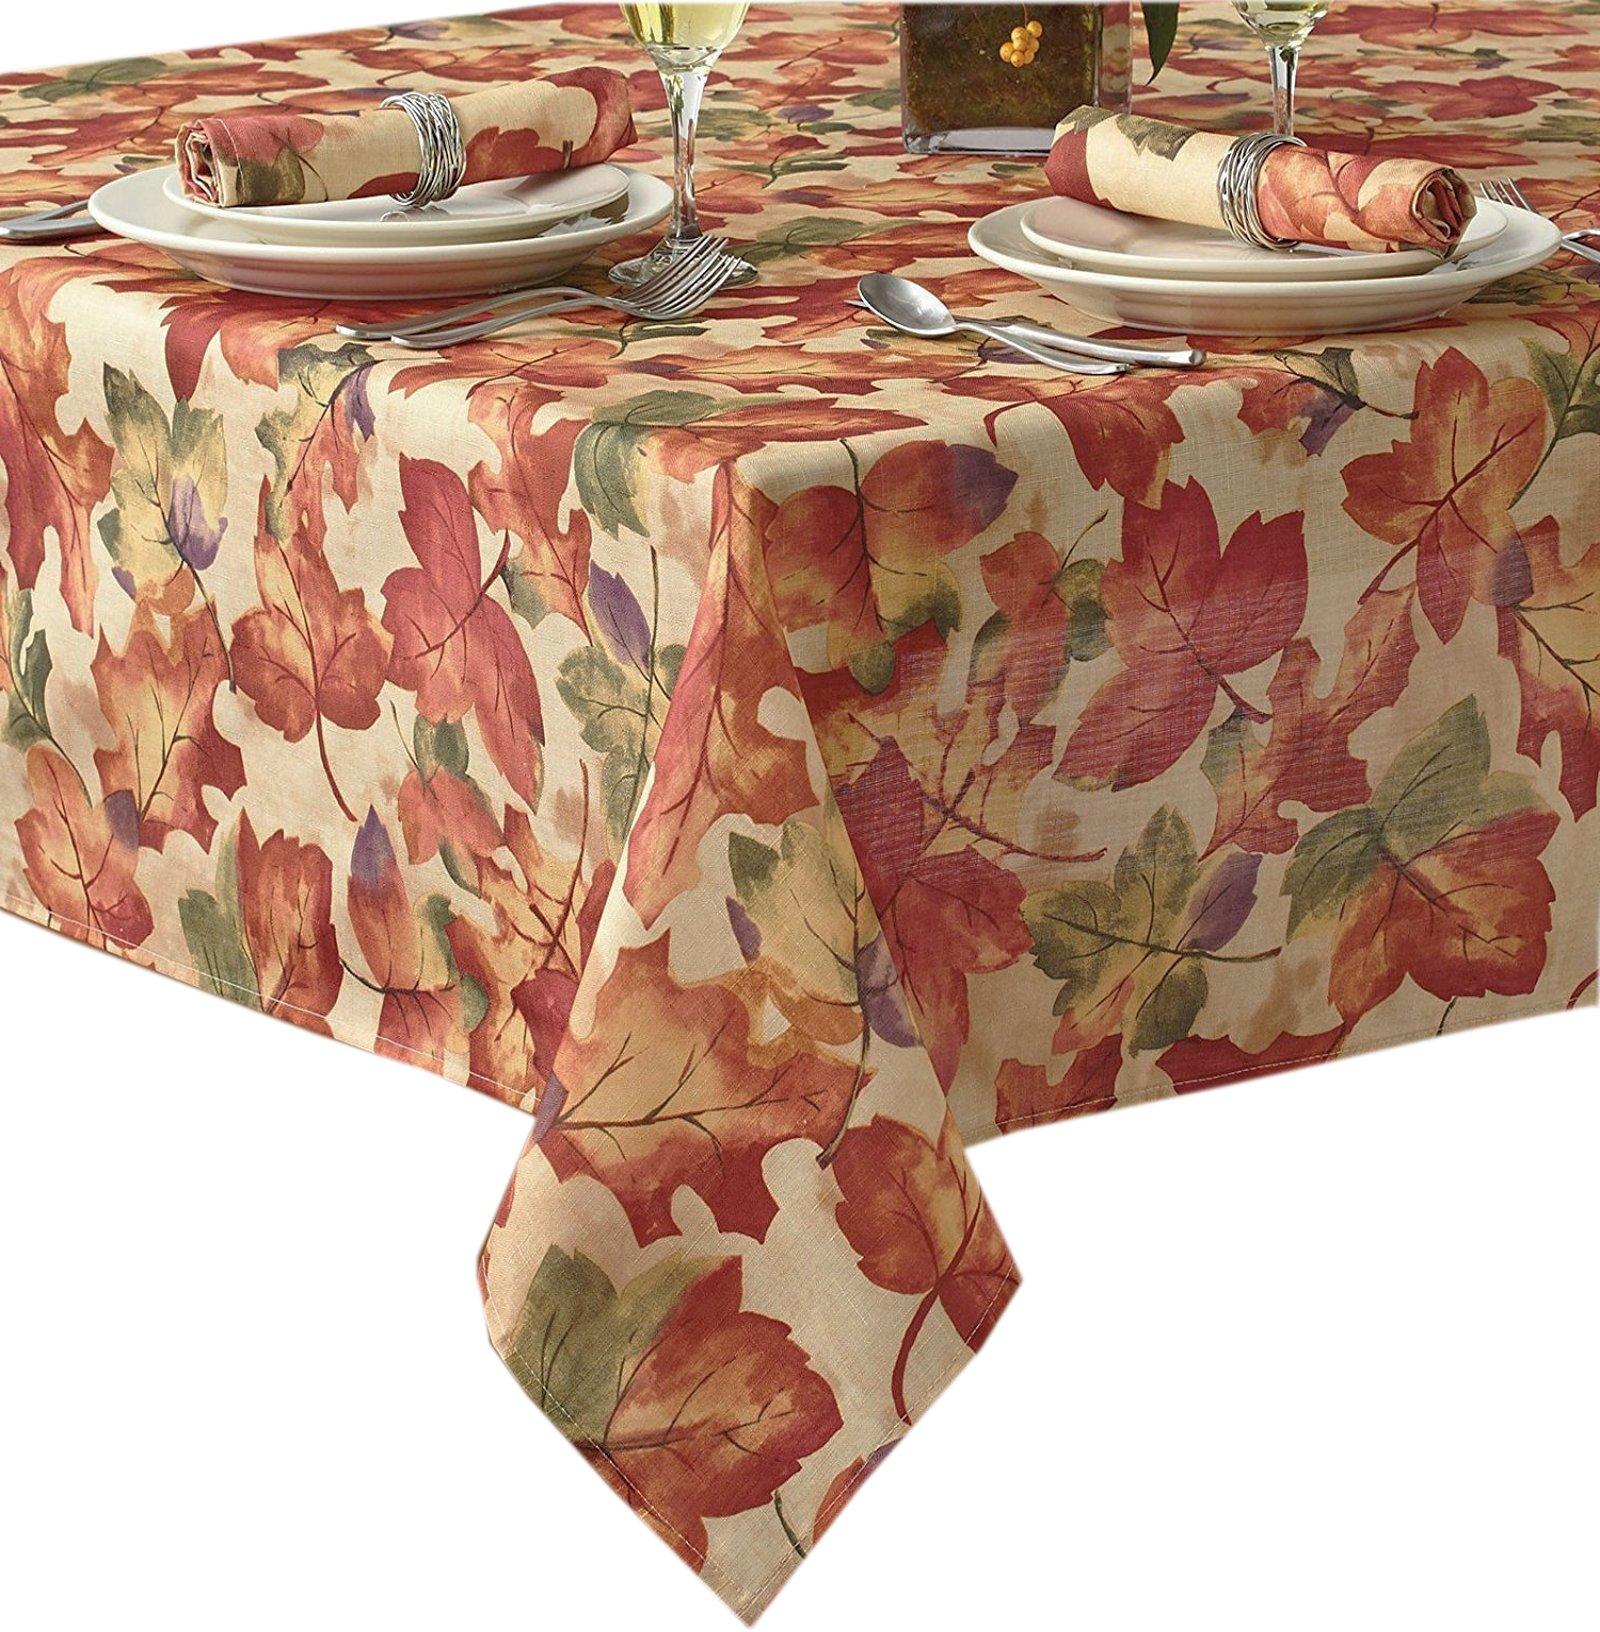 Harvest Leaf Festival Autumn and Thanksgiving  Fabric Print Napkin Set, Set of 8 Napkins by Newbridge (Image #2)